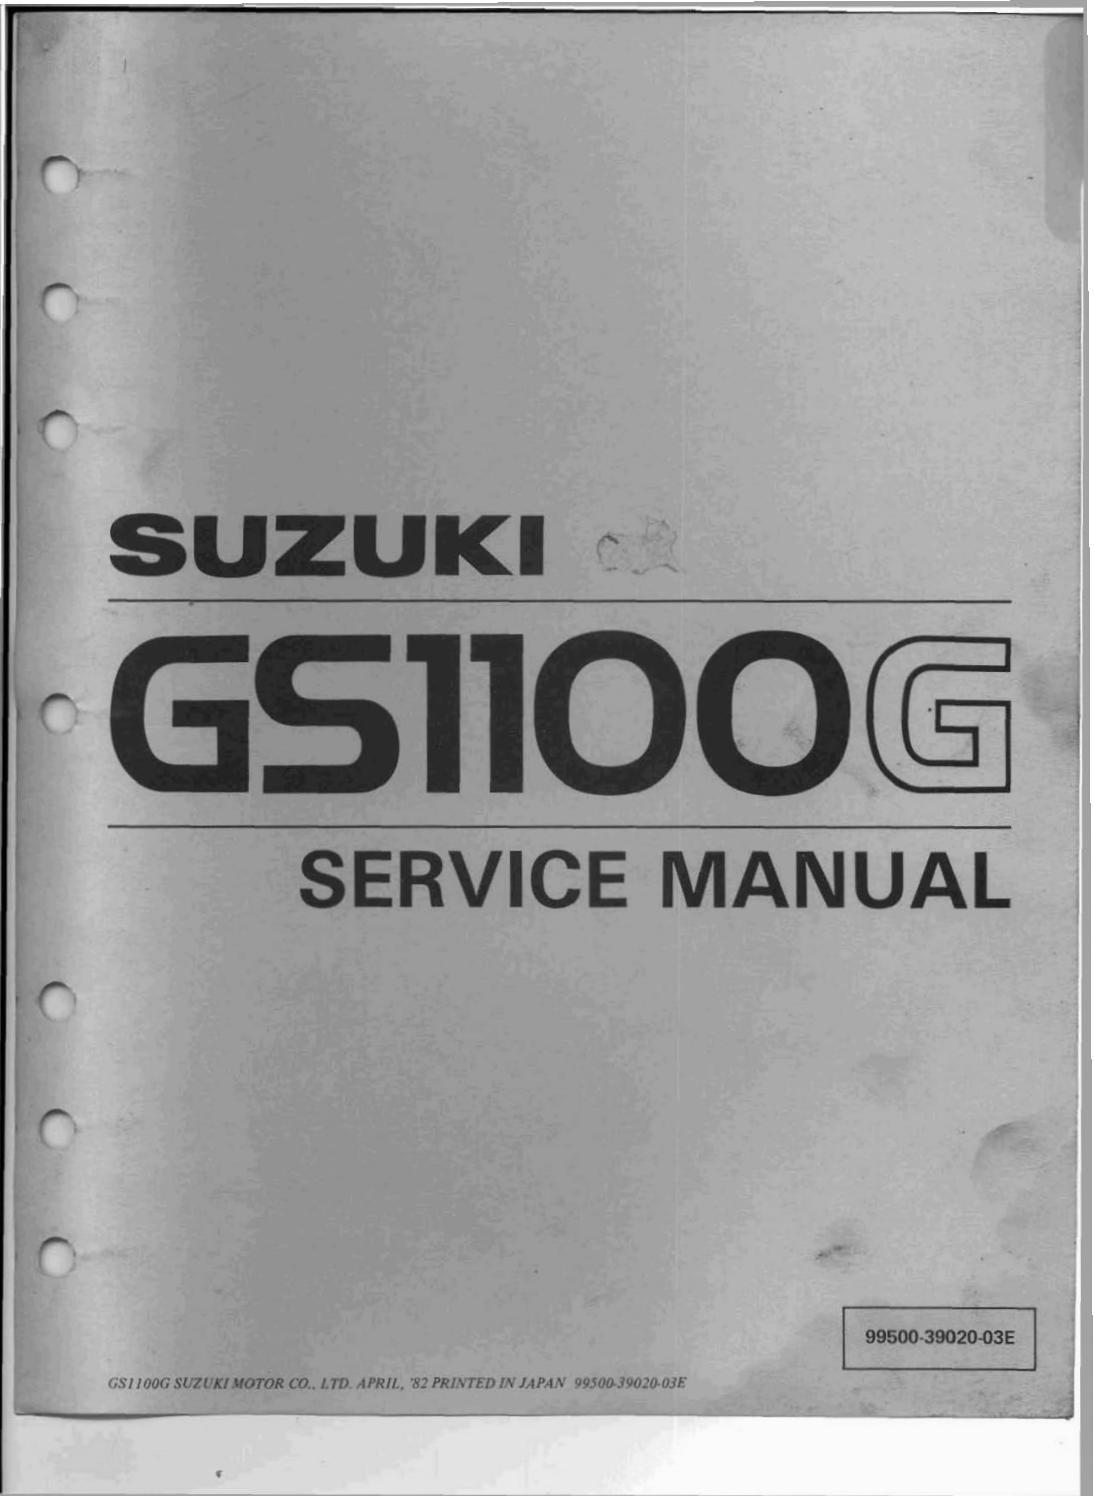 1982 1984 Suzuki Gs1100g Gs1100gl Gs1100gk Service Manual Pdf Download By Heydownloads Issuu